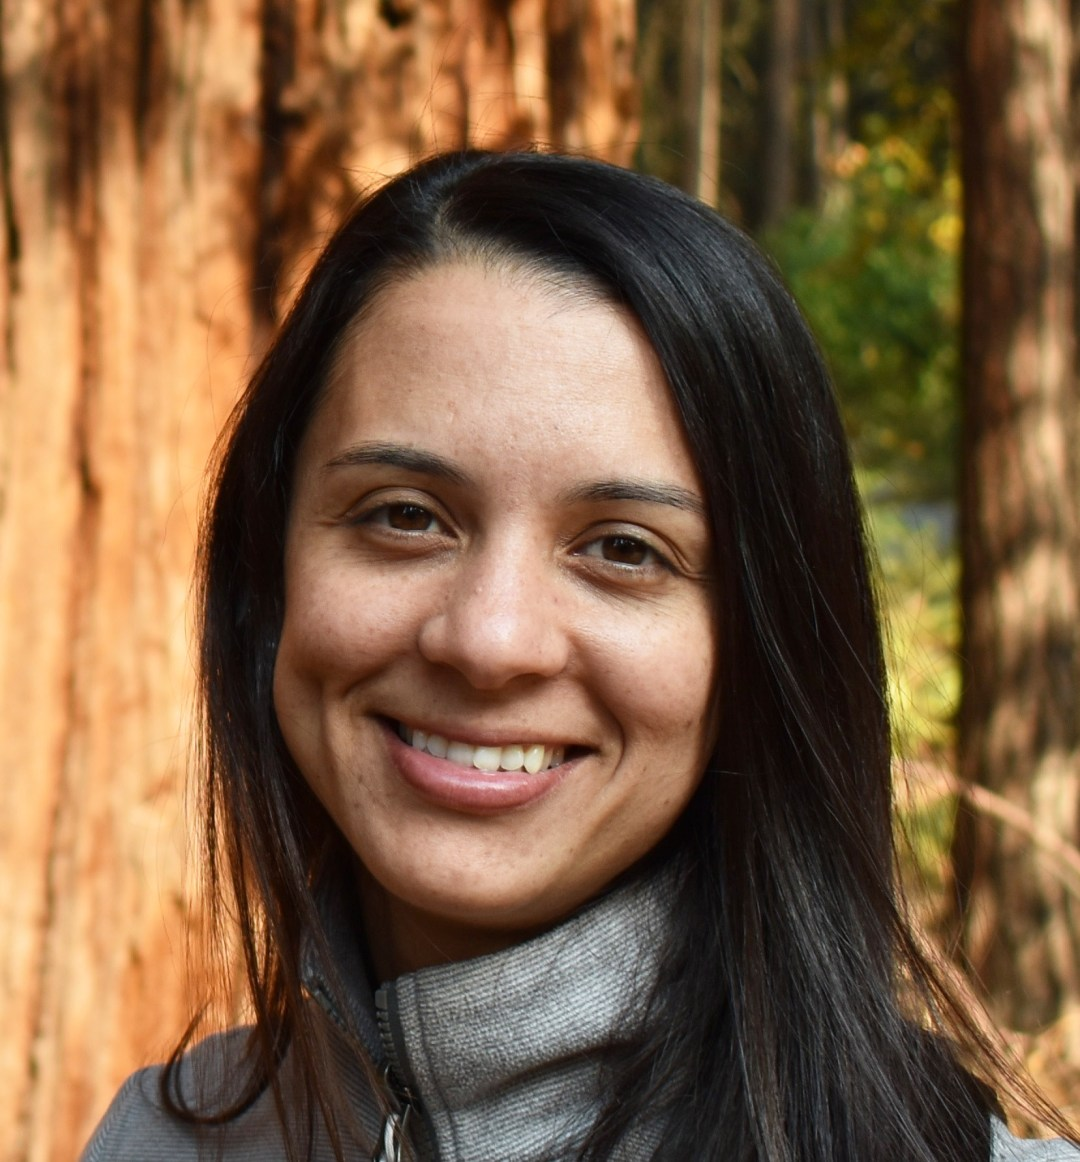 Ana Carolina Dantas Machado, PhD